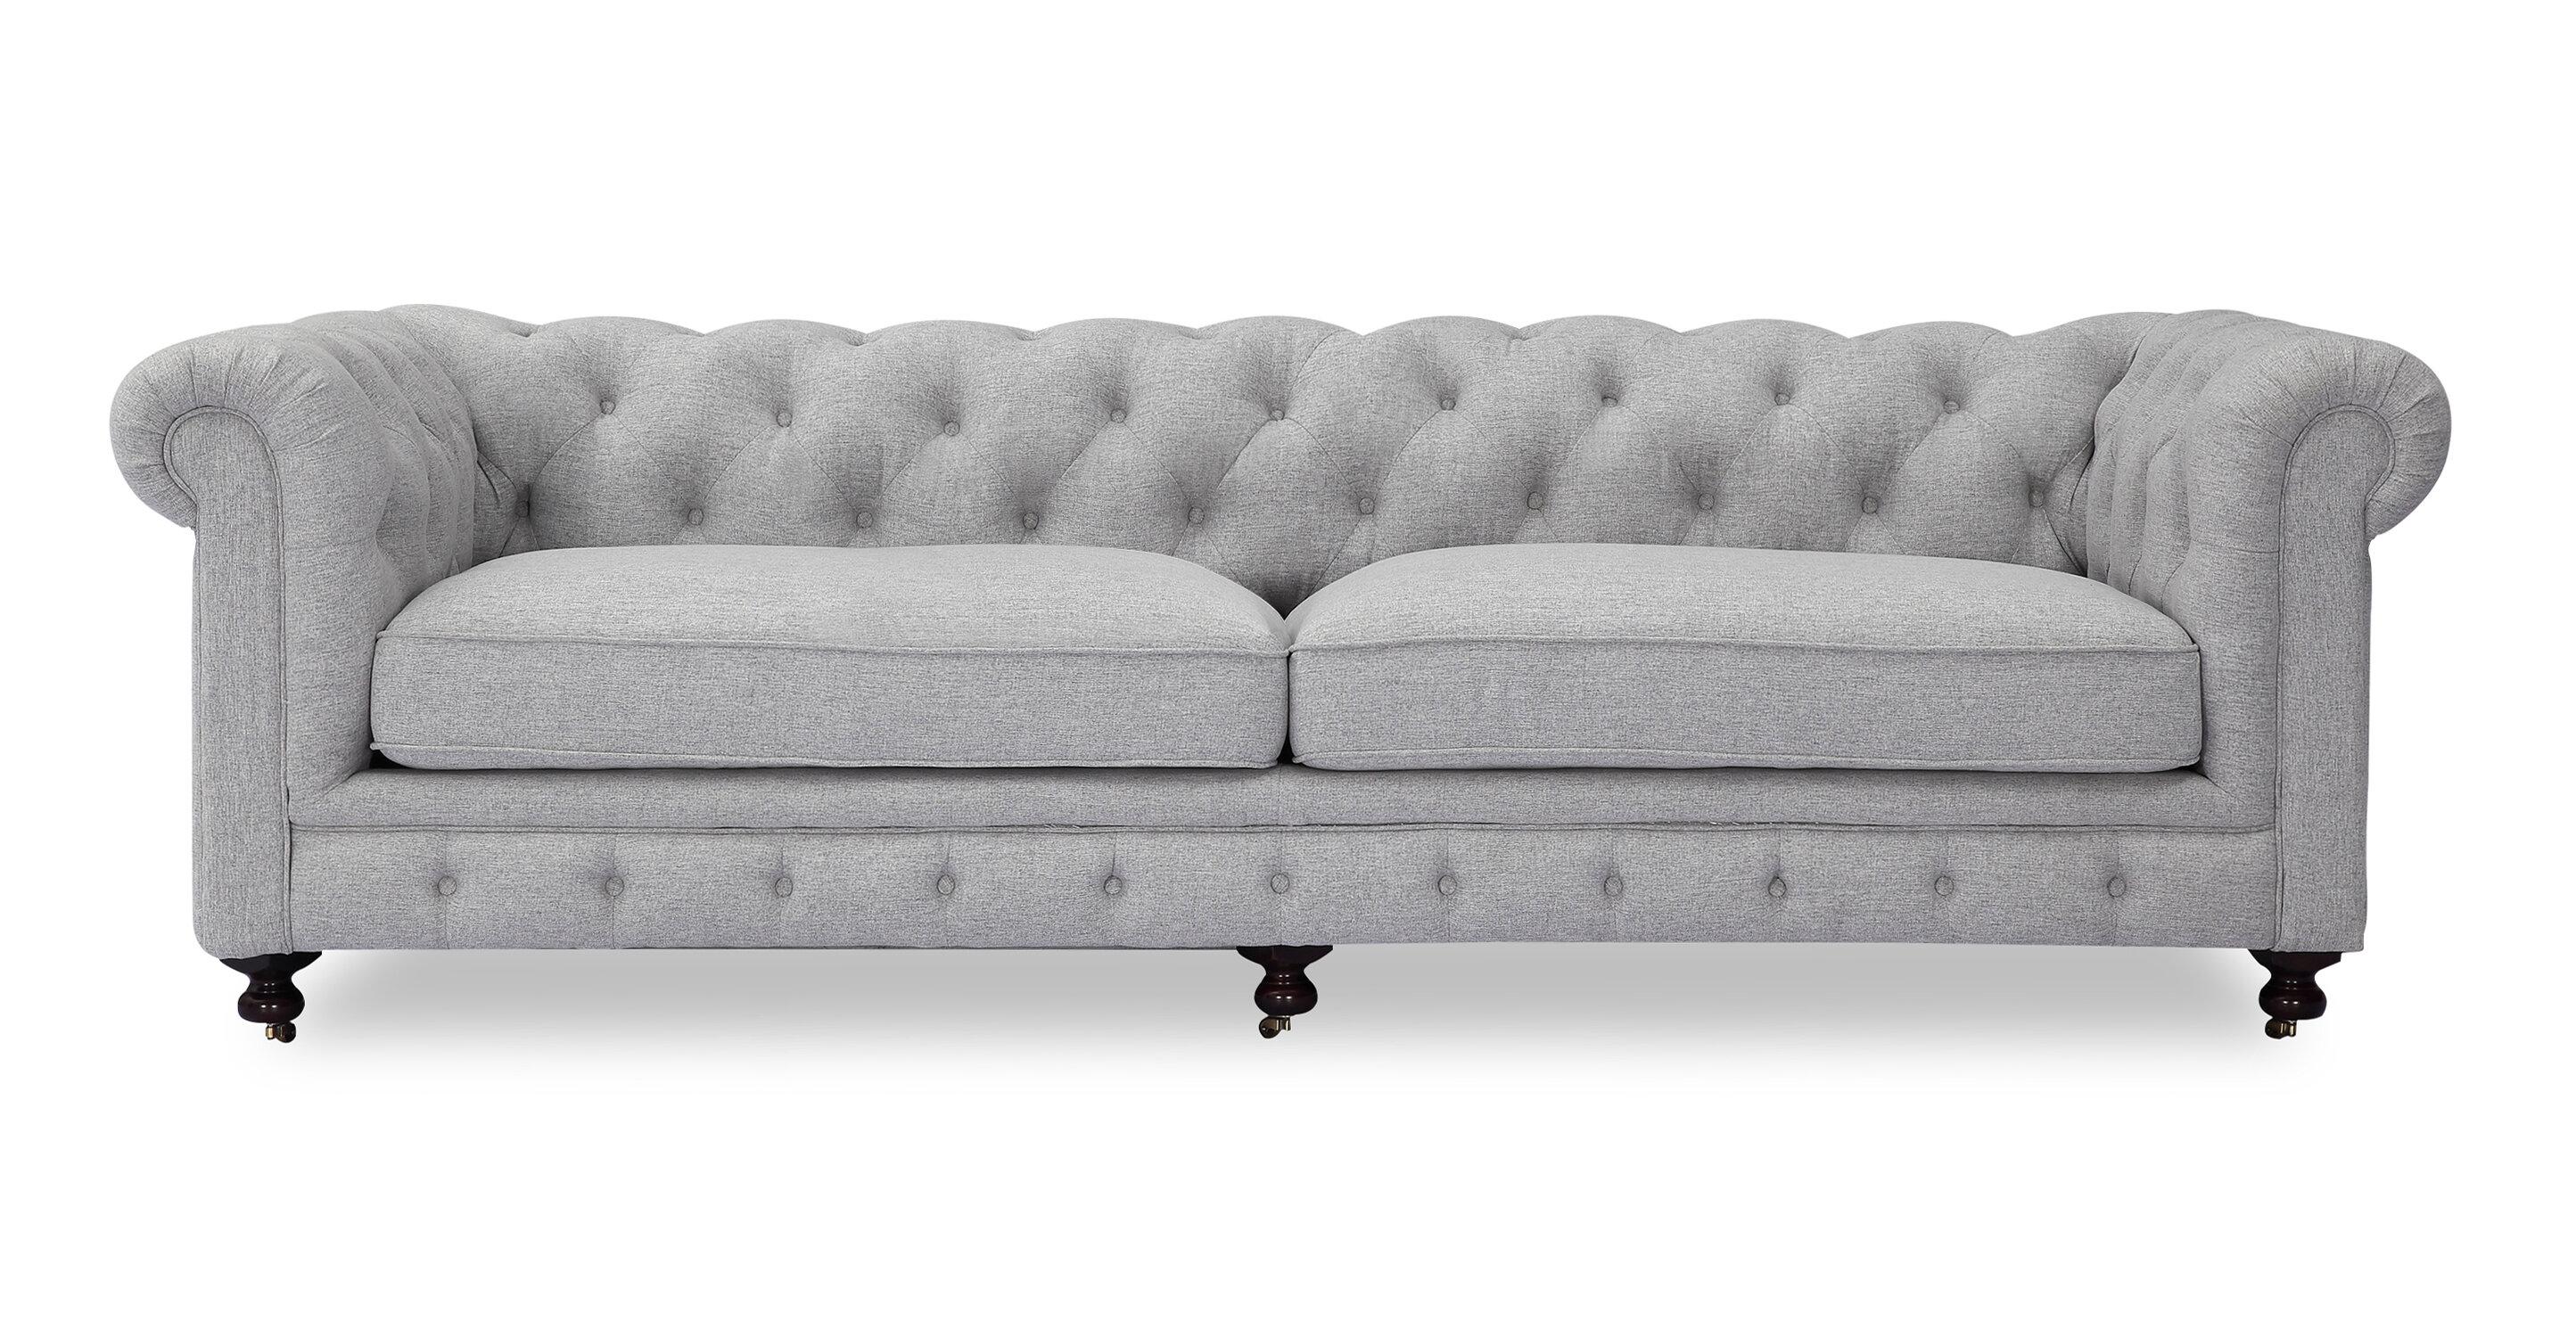 Kardiel Modern Classic Chesterfield Sofa Reviews Wayfair